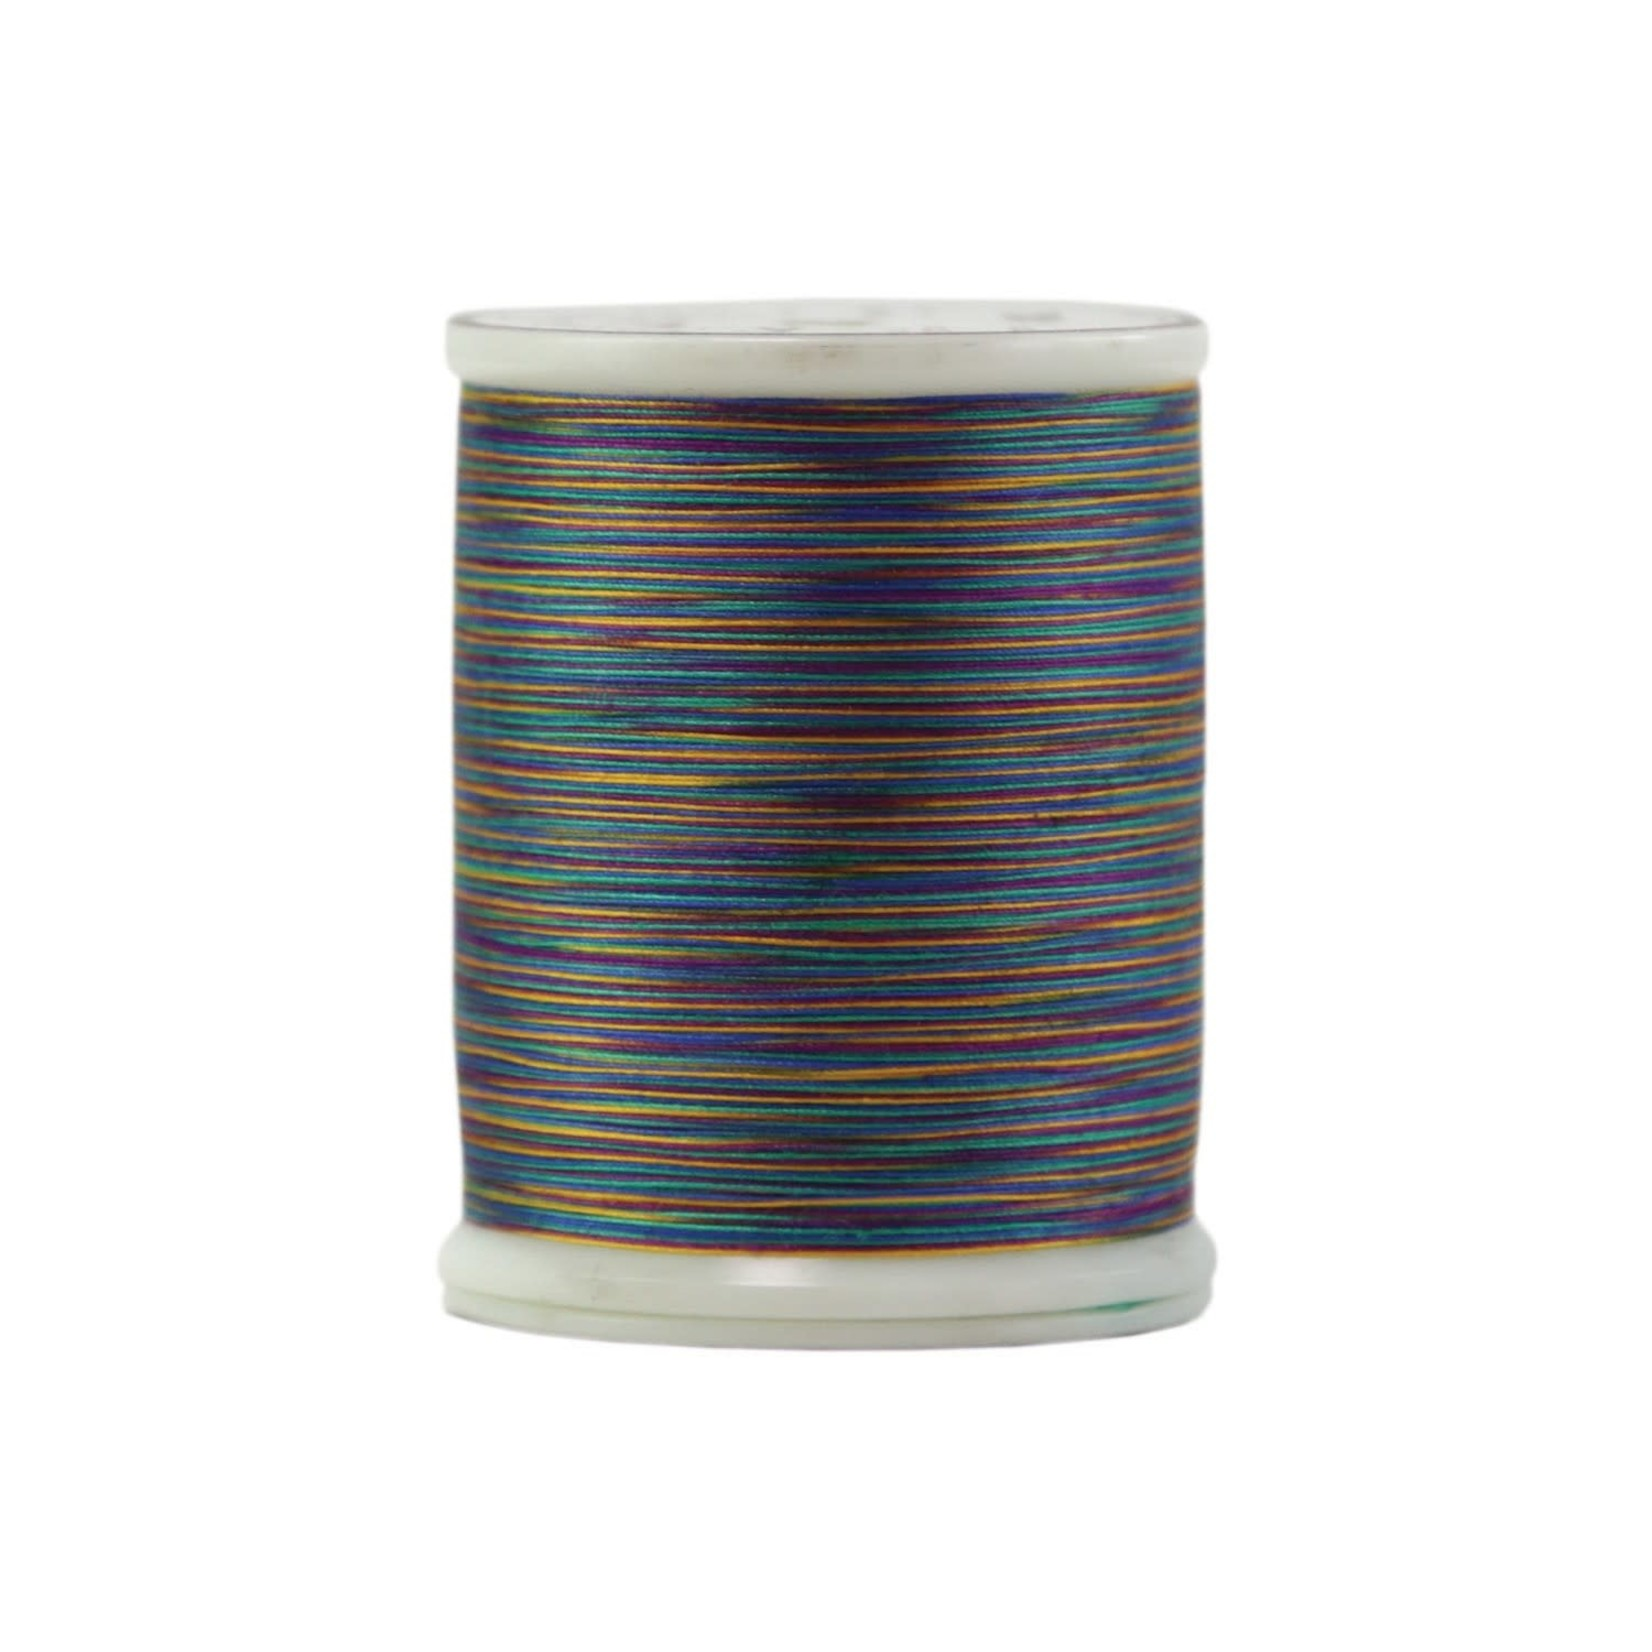 Superior Threads King Tut - #40 - 457 m - 1042 Pizzazz